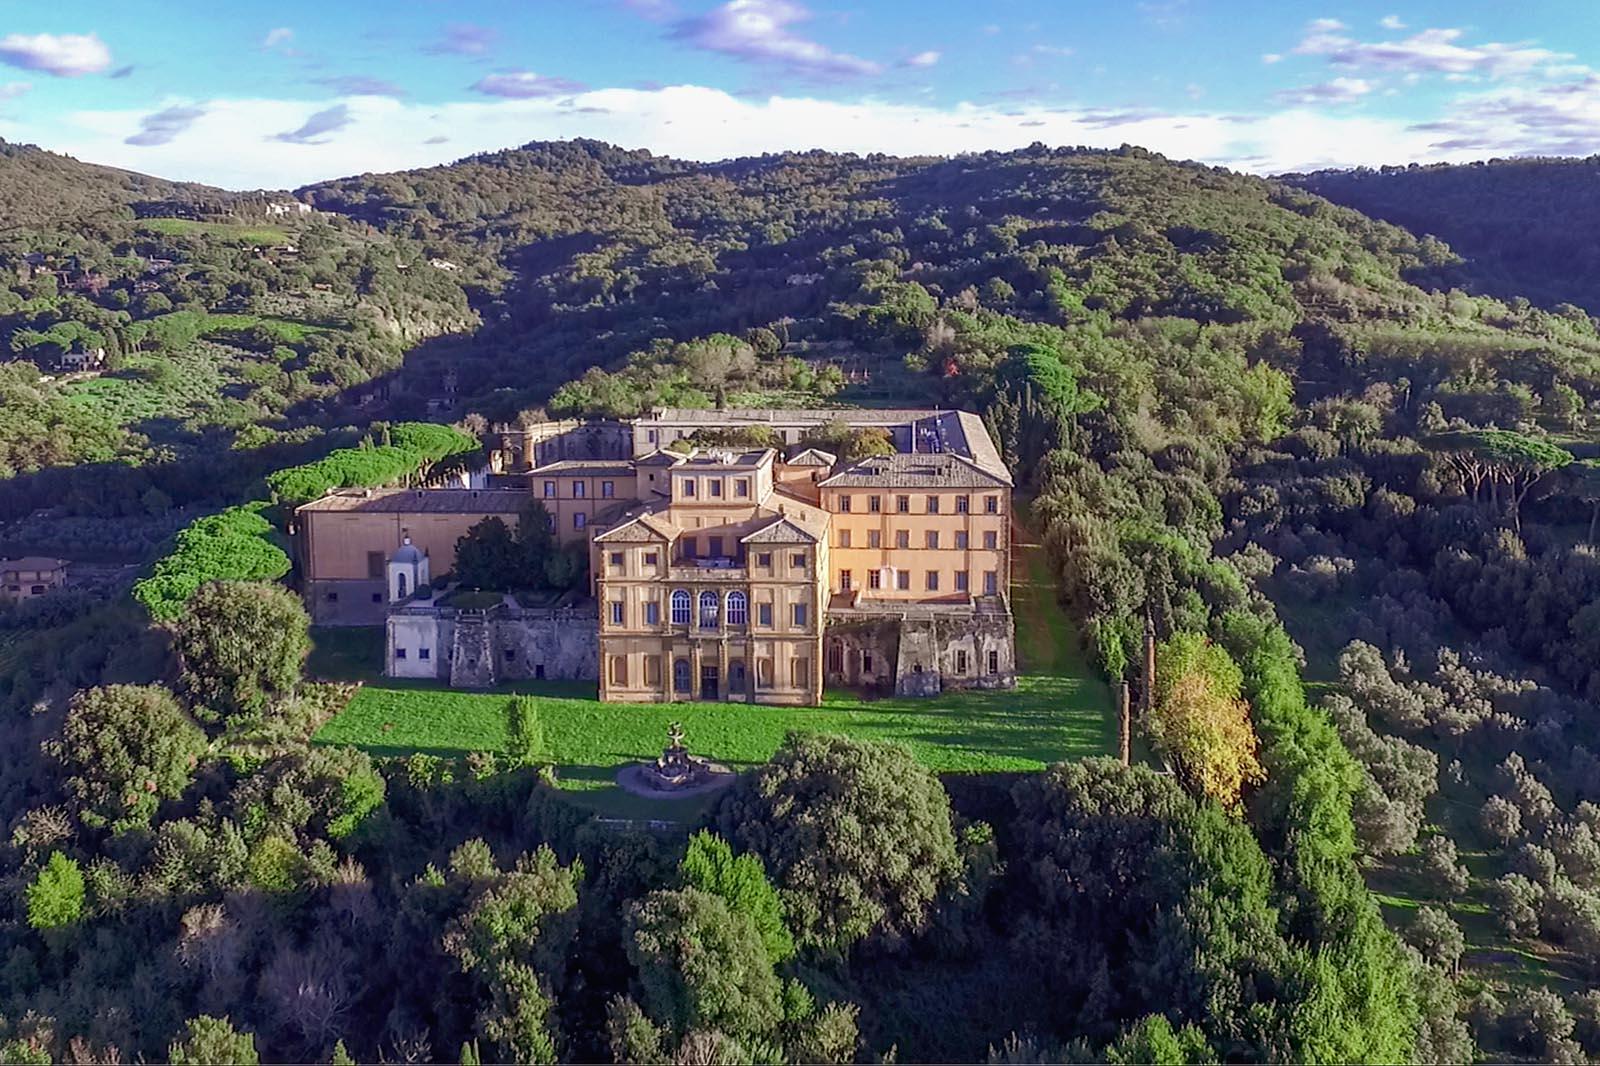 Villa Mondragone - veduta aerea